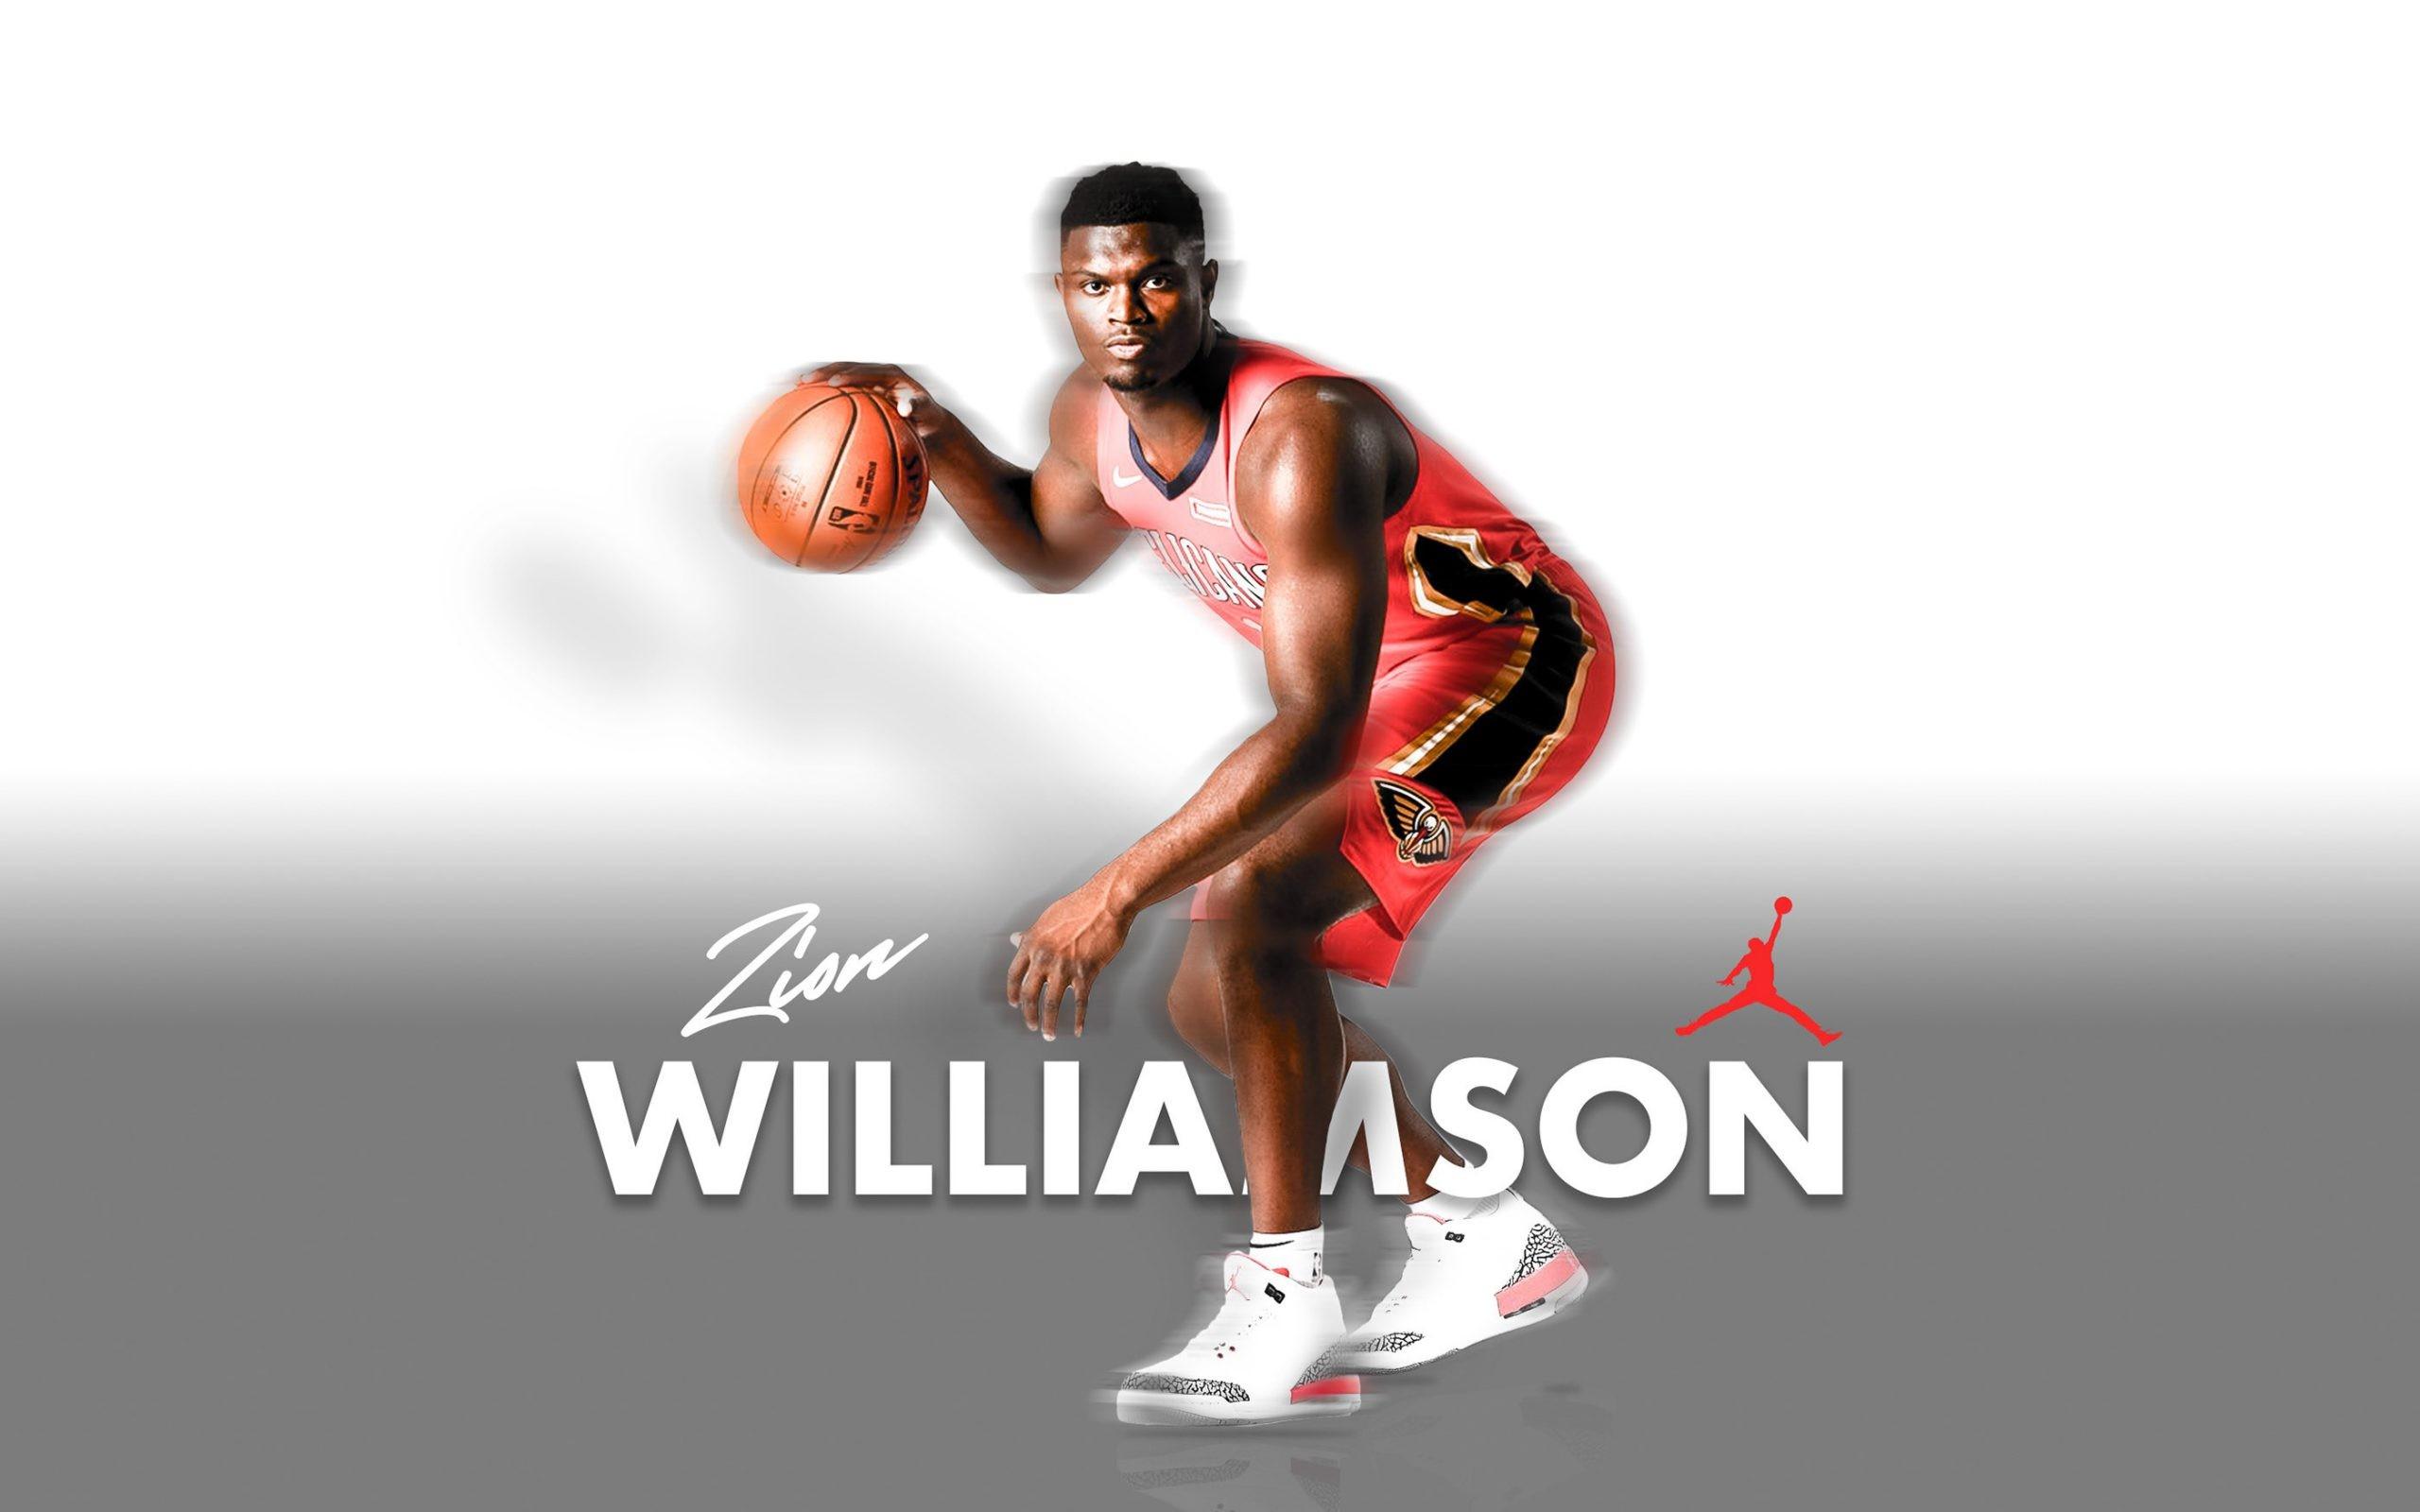 Zion Williamson Hd Wallpaper - KoLPaPer - Awesome Free HD ...